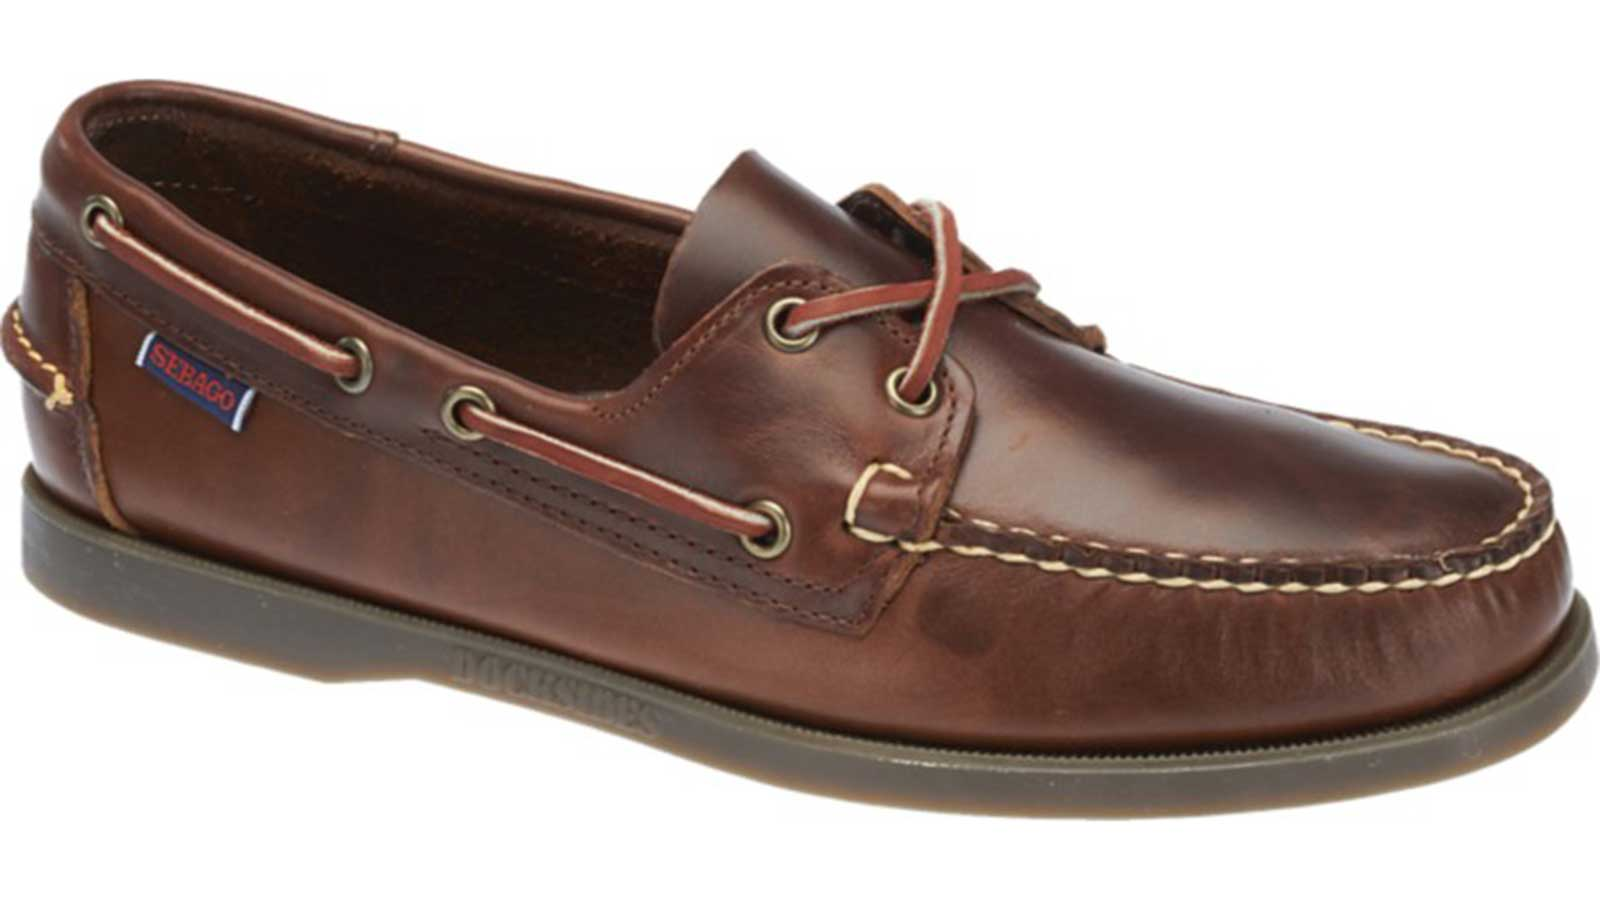 Sebago Handsewn Men's Boat Shoe | best mens boat shoes